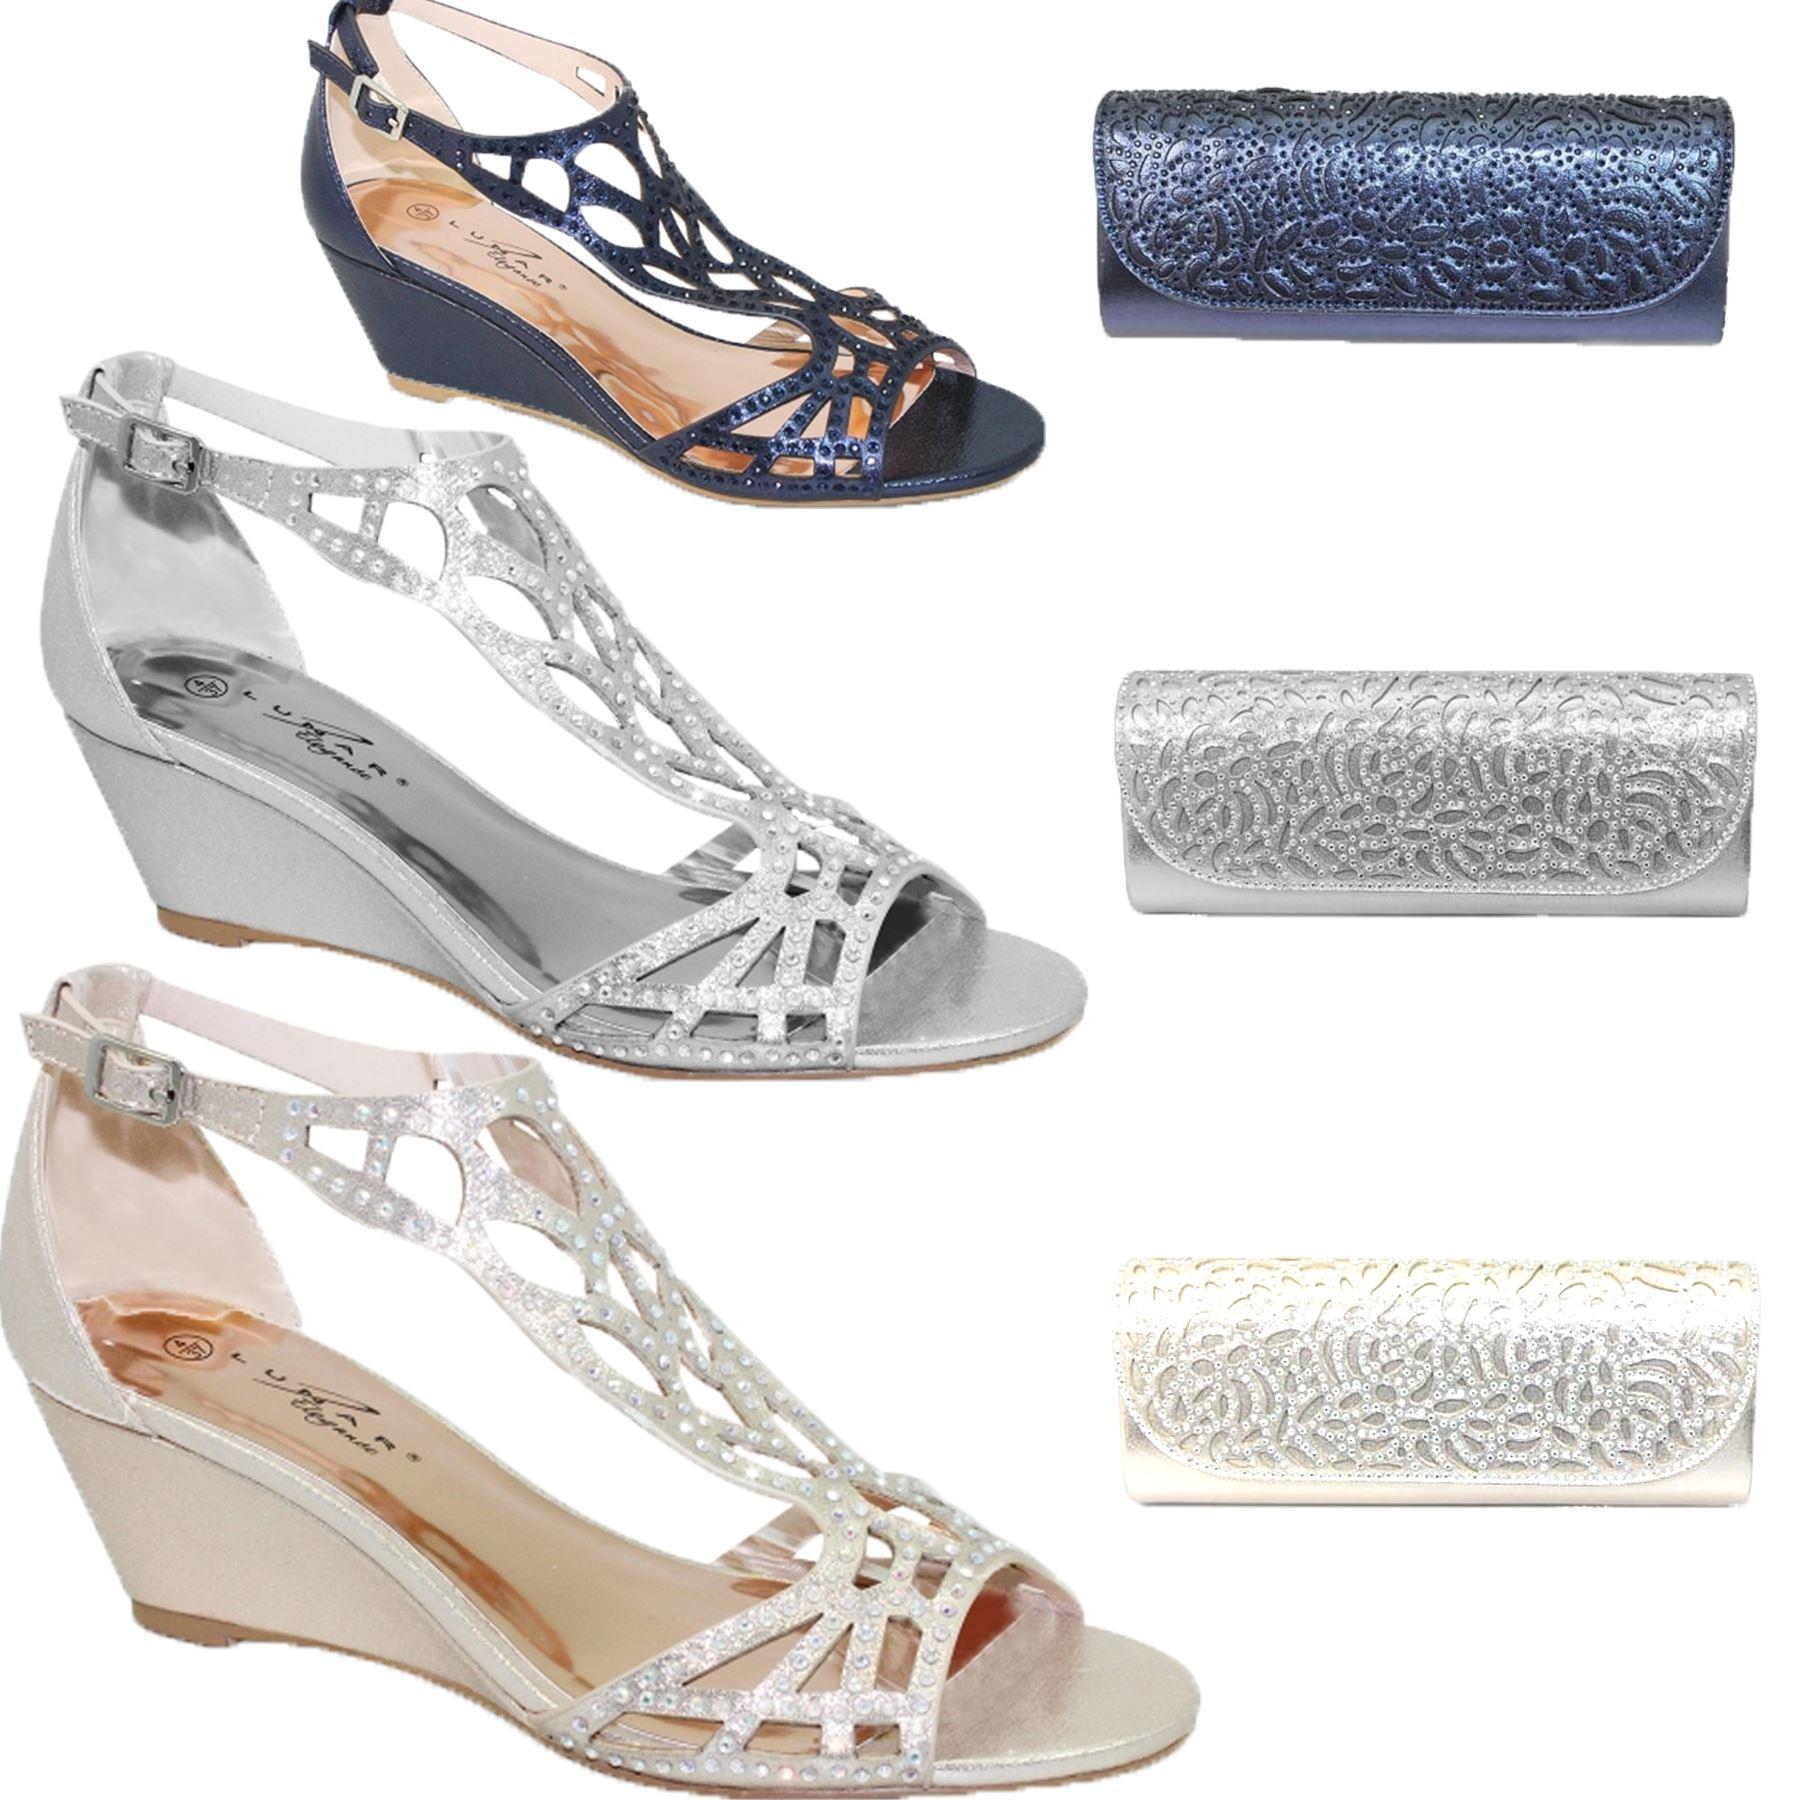 3c408d81a Details about FLC111 Denton Rhinestone Strap Diamante Peep Toe Wedge Sandals  Clutch Bag